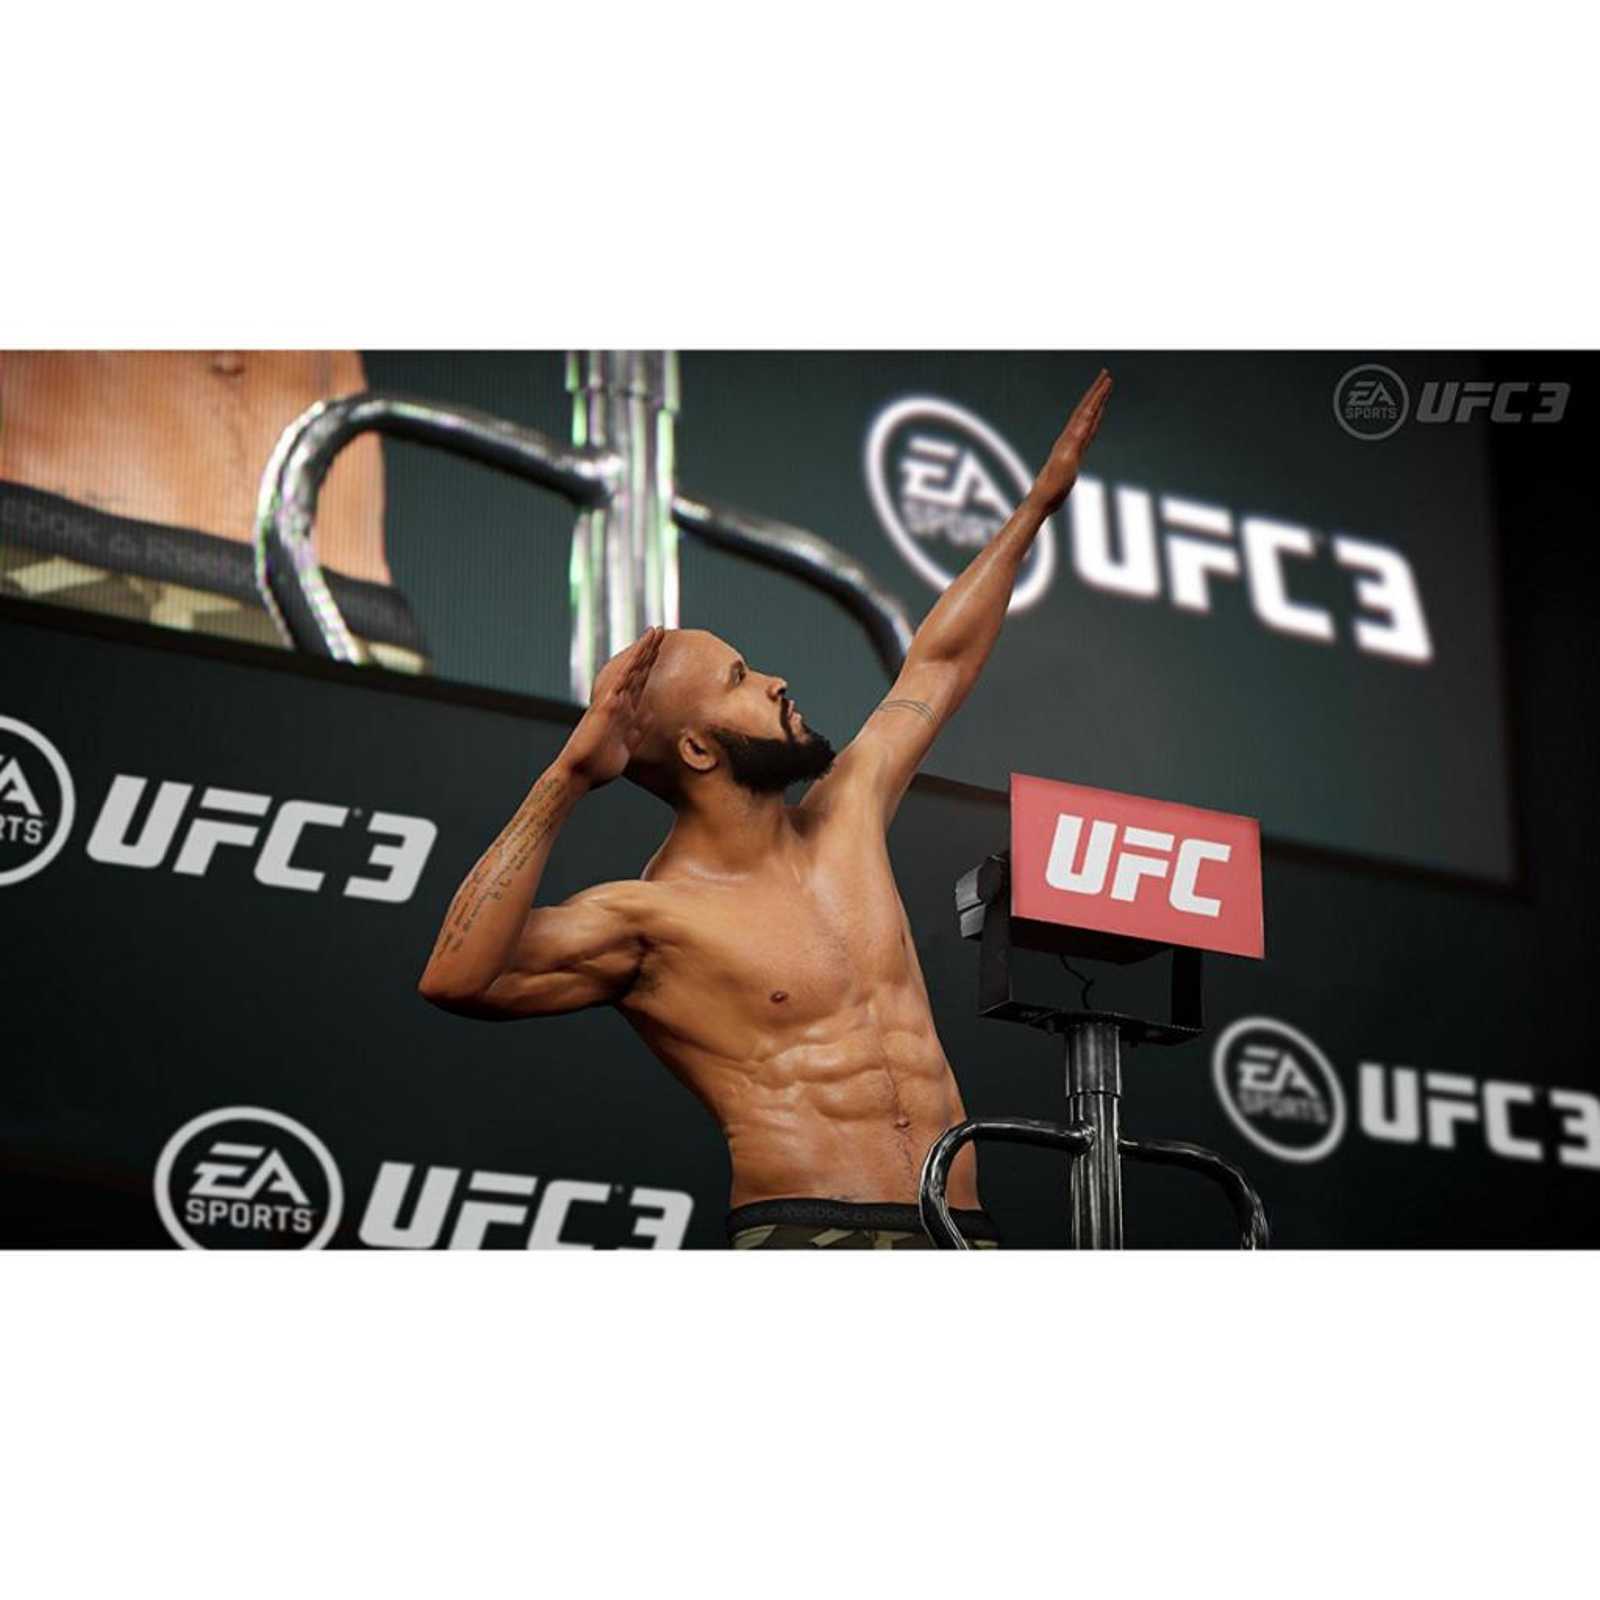 Игра Sony EA SPORTS UFC 3 [PS4, Russian subtitles] (1034661) изображение 3